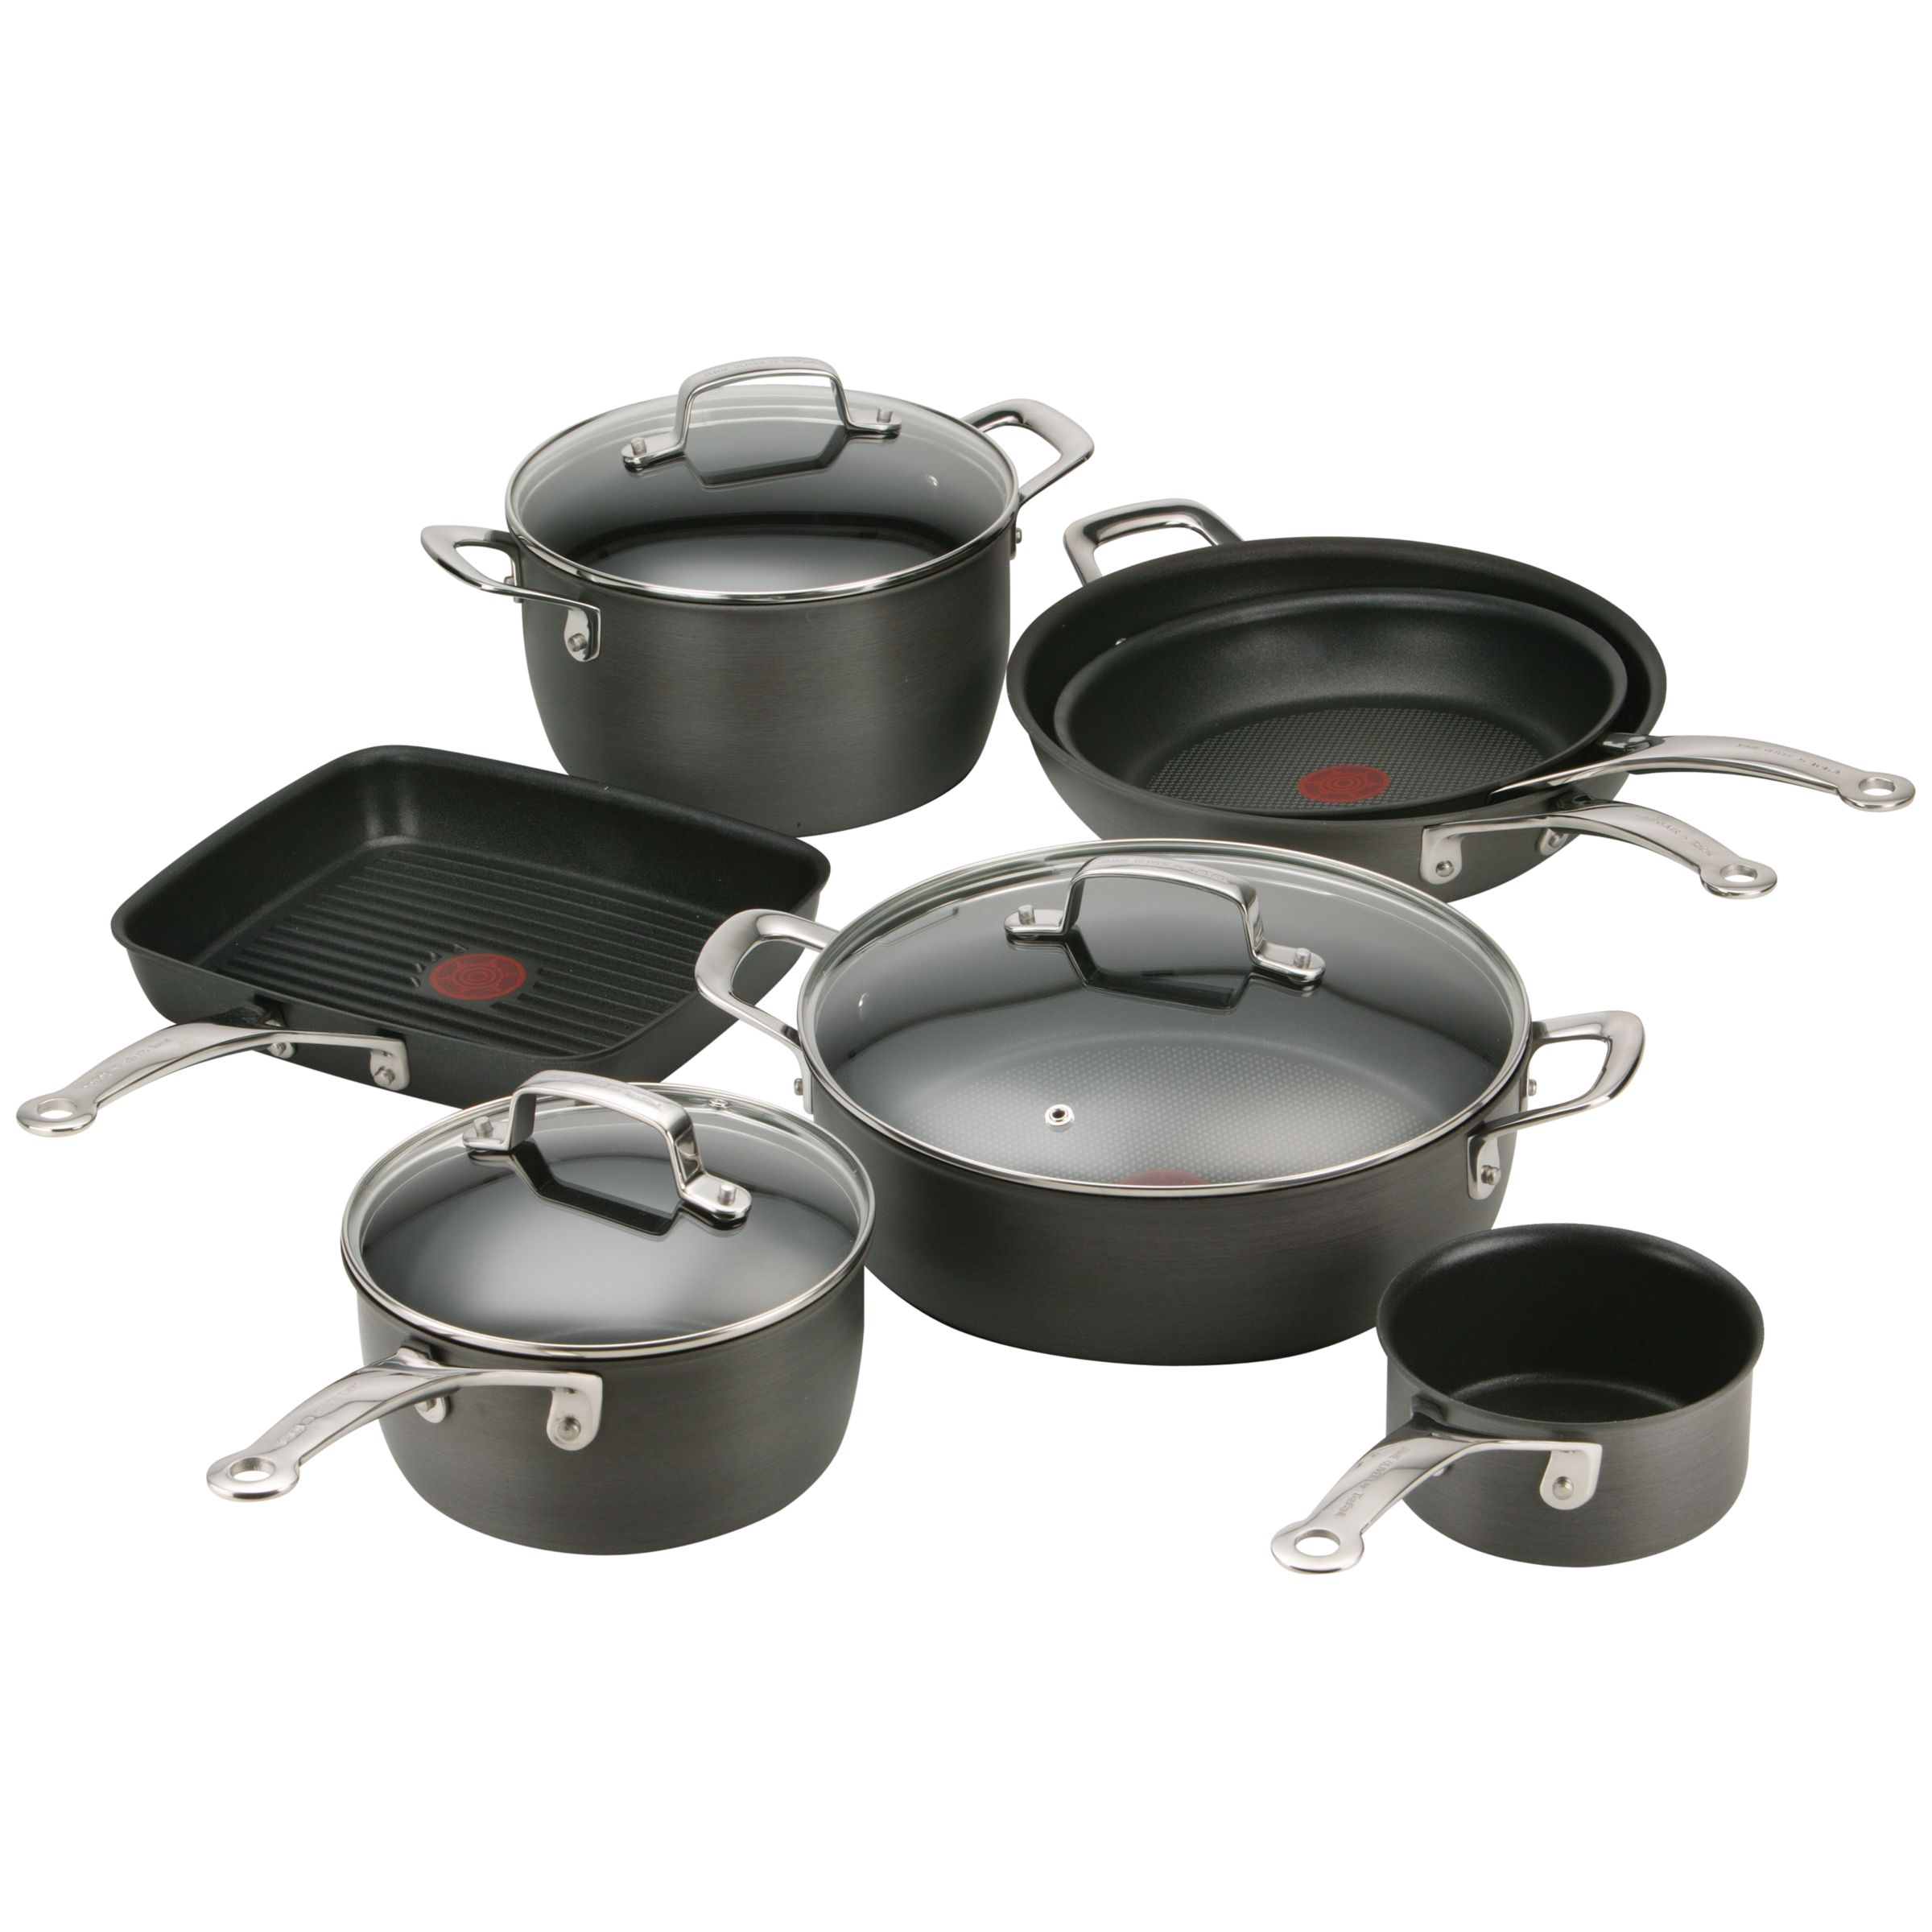 induction cookware shop for cheap cookware utensils. Black Bedroom Furniture Sets. Home Design Ideas